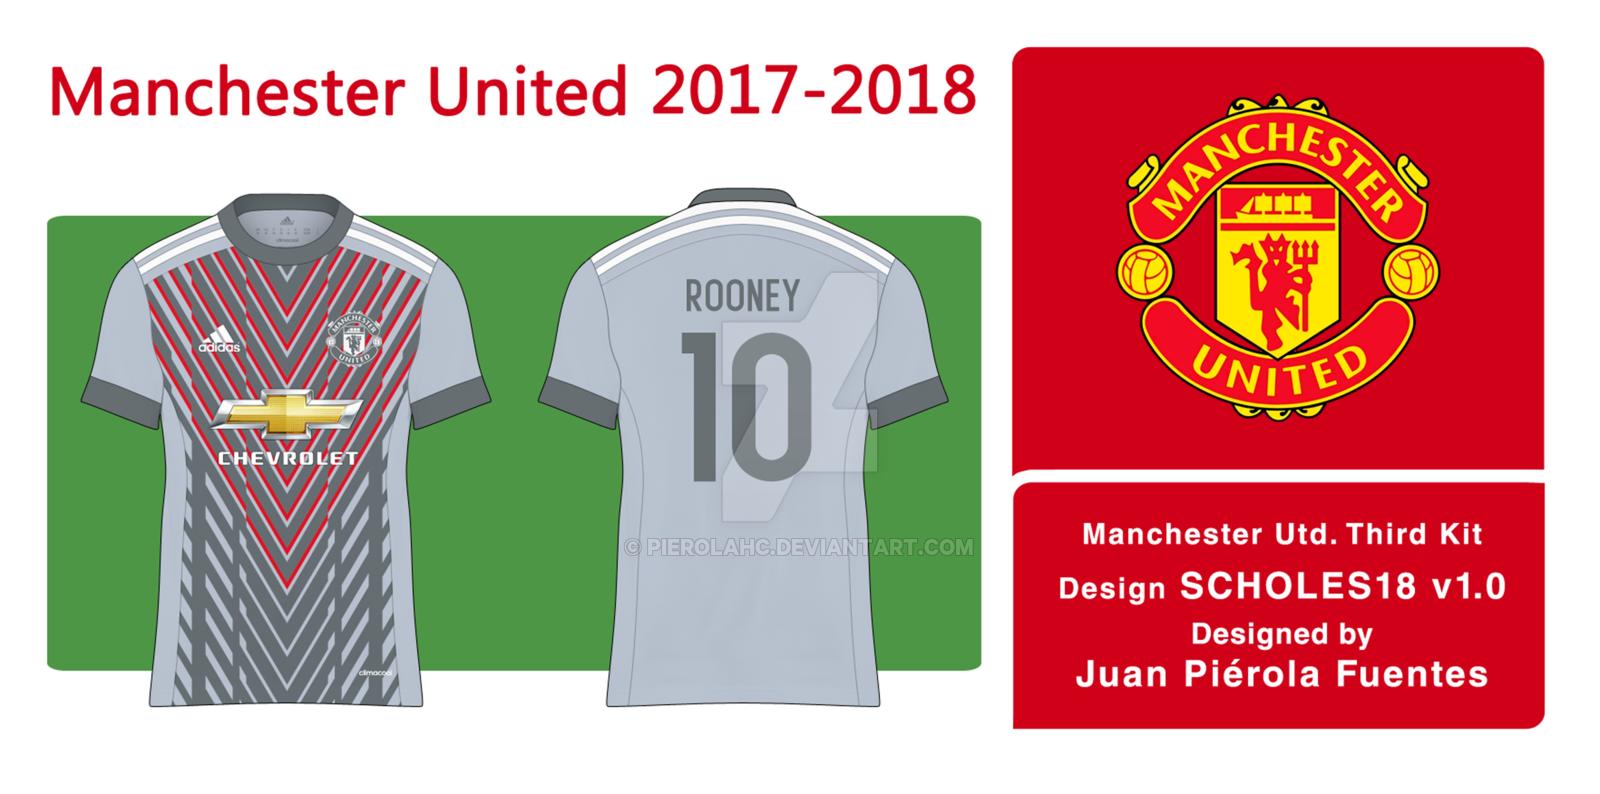 d39eb650b39 Man Utd Wallpapers 2017 1920x1080. View 0. Footie by screwbald 1600x794